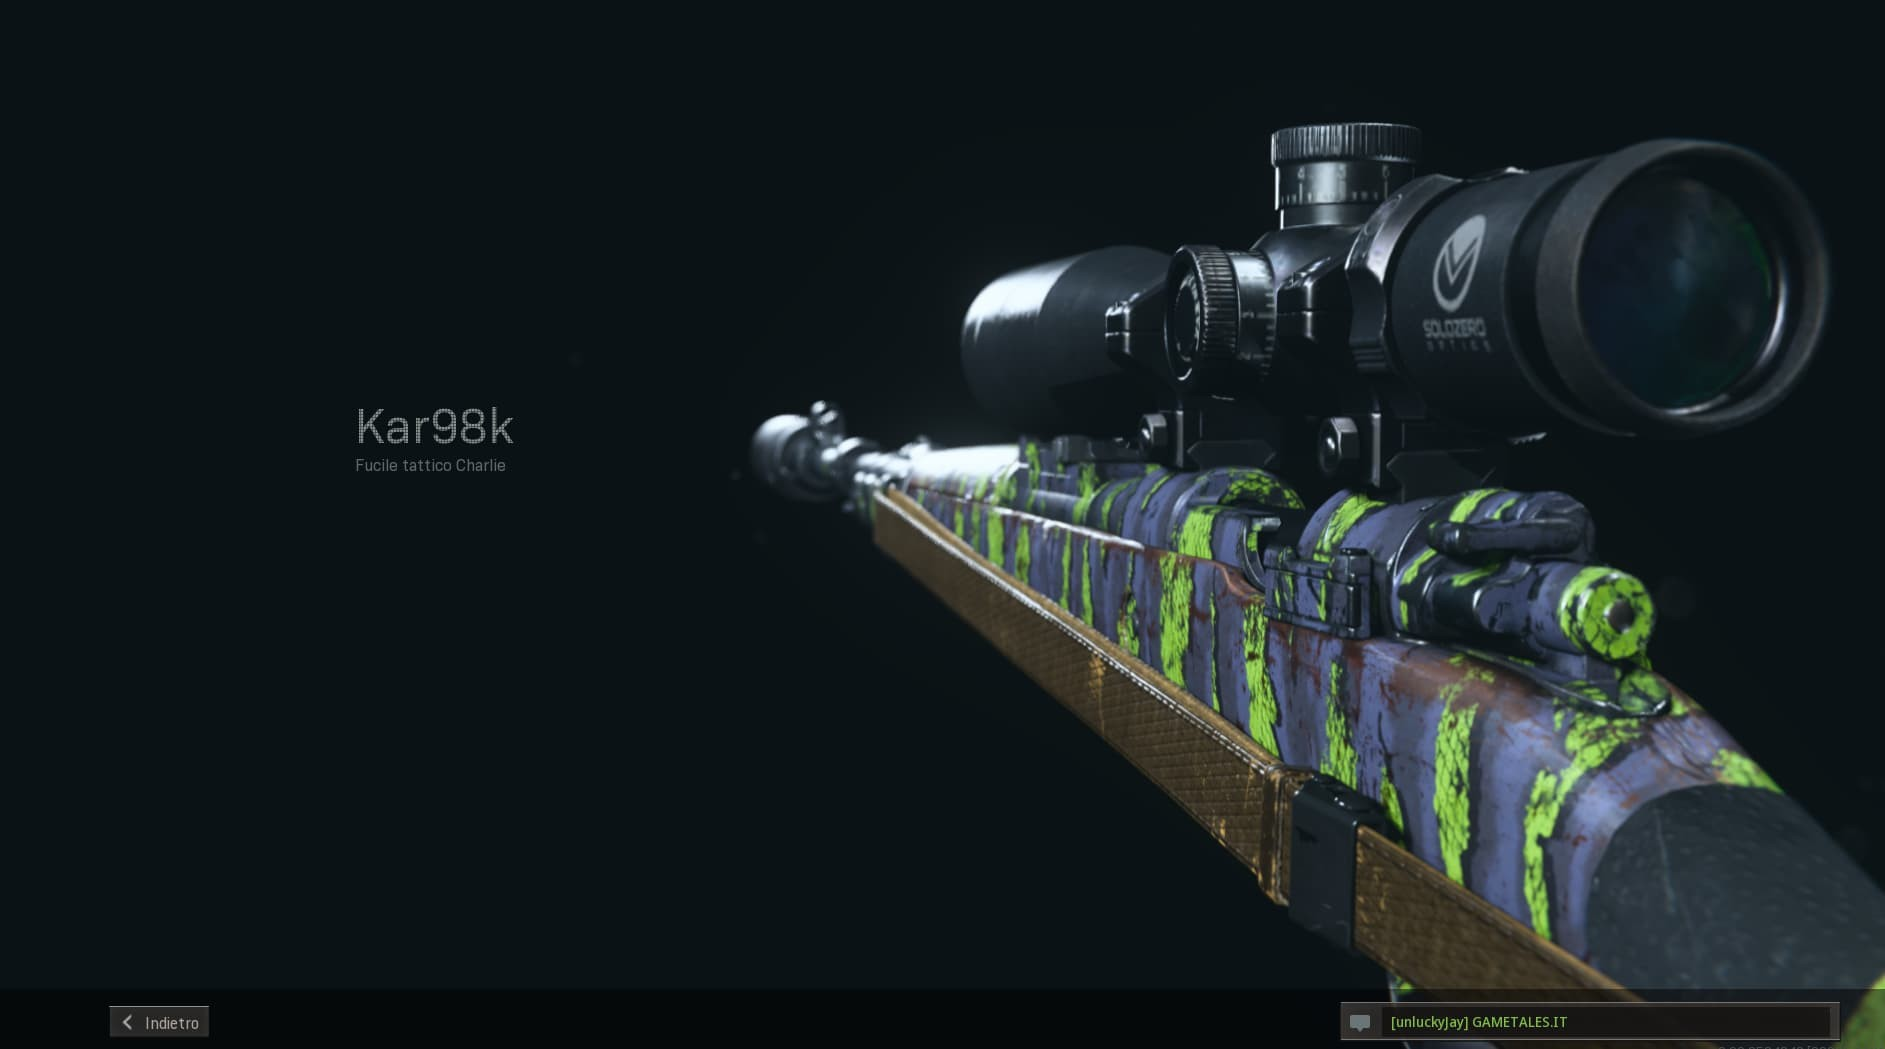 Call of Duty Warzone Build kar98k gmt monoblocco anteprima